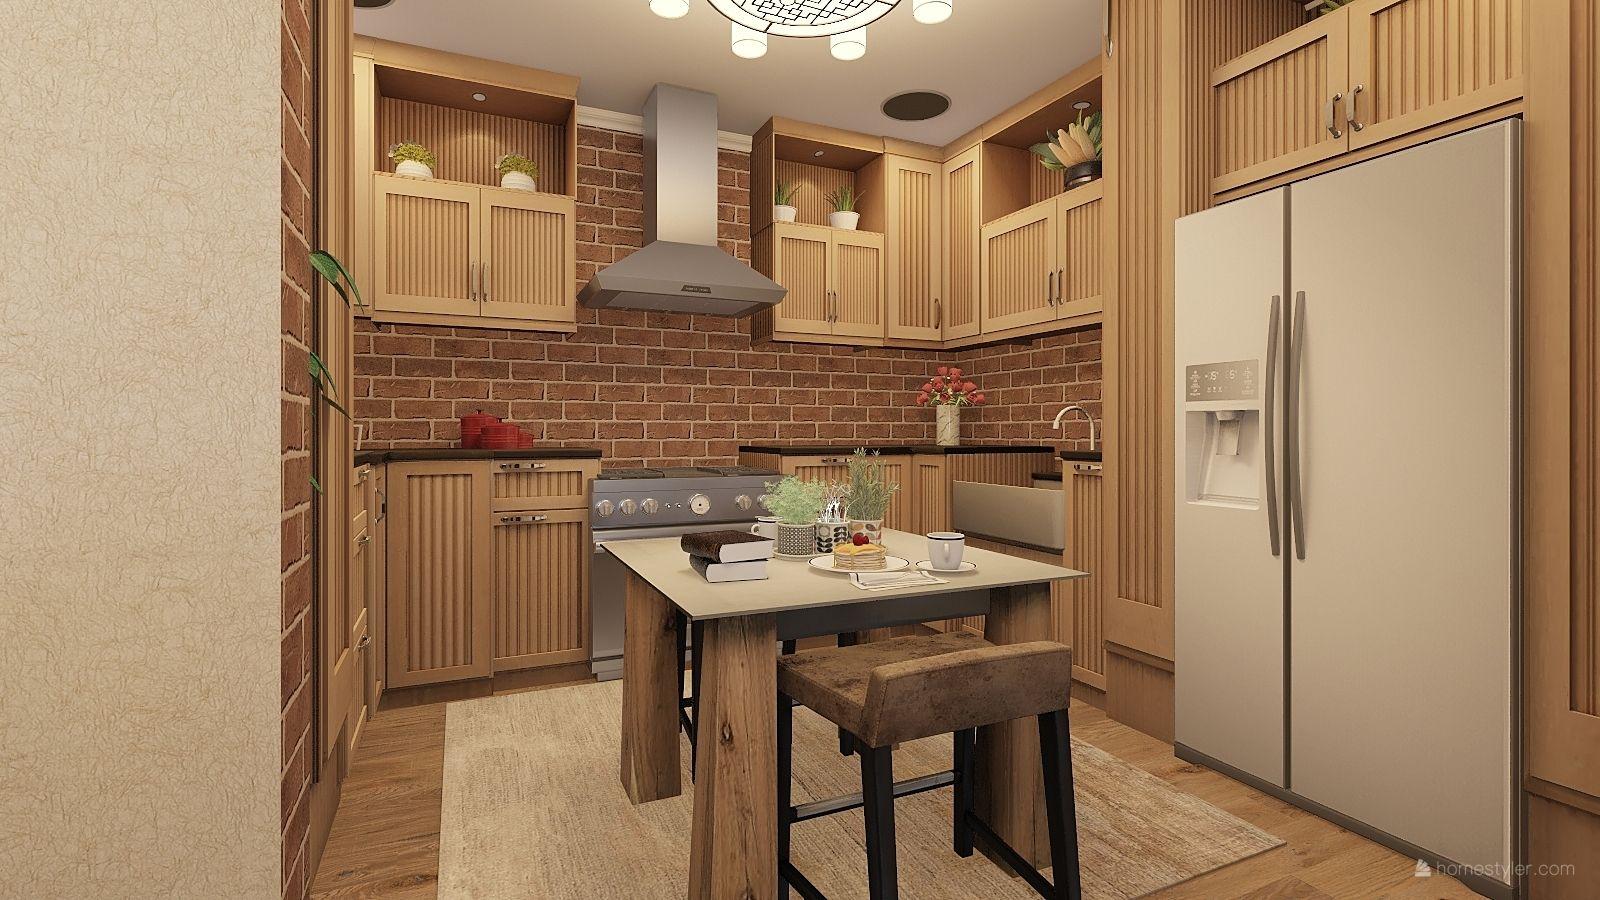 Kitchen design by Alaa Hamed | Interior design tools, 3d ...